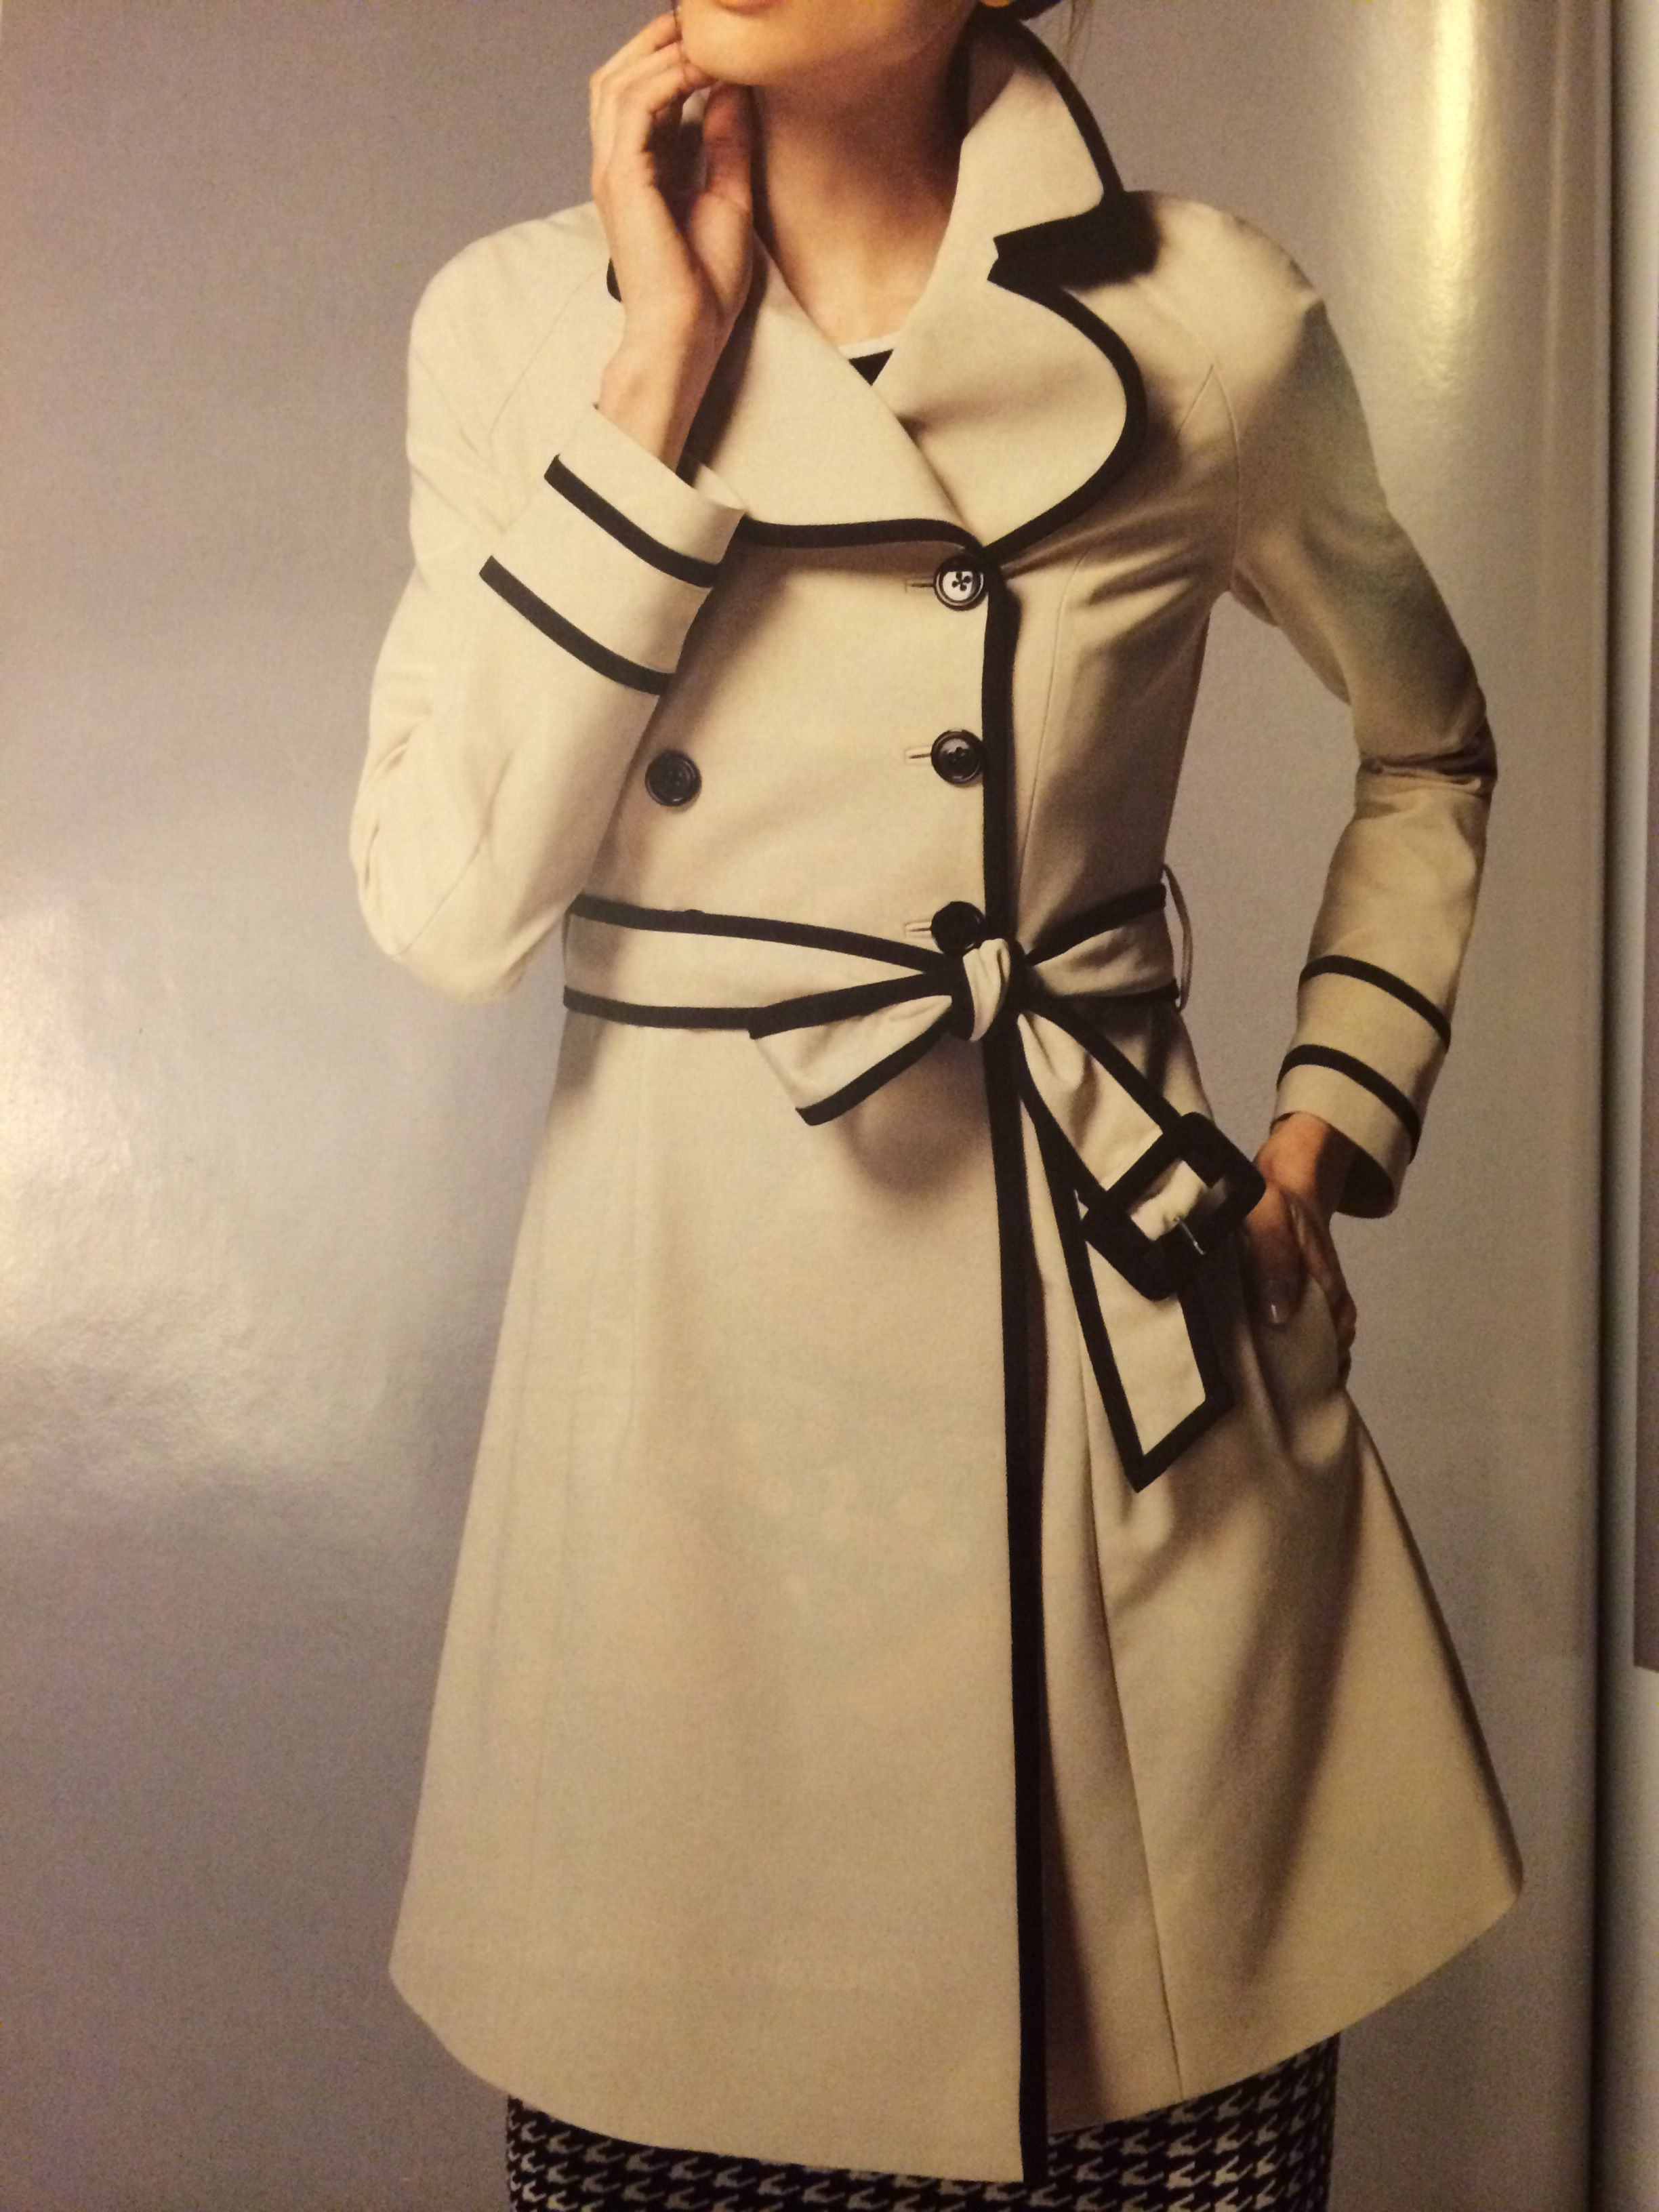 Elle Trench Coat At Kohl S Fashion Coat Trench Coat [ 3264 x 2448 Pixel ]